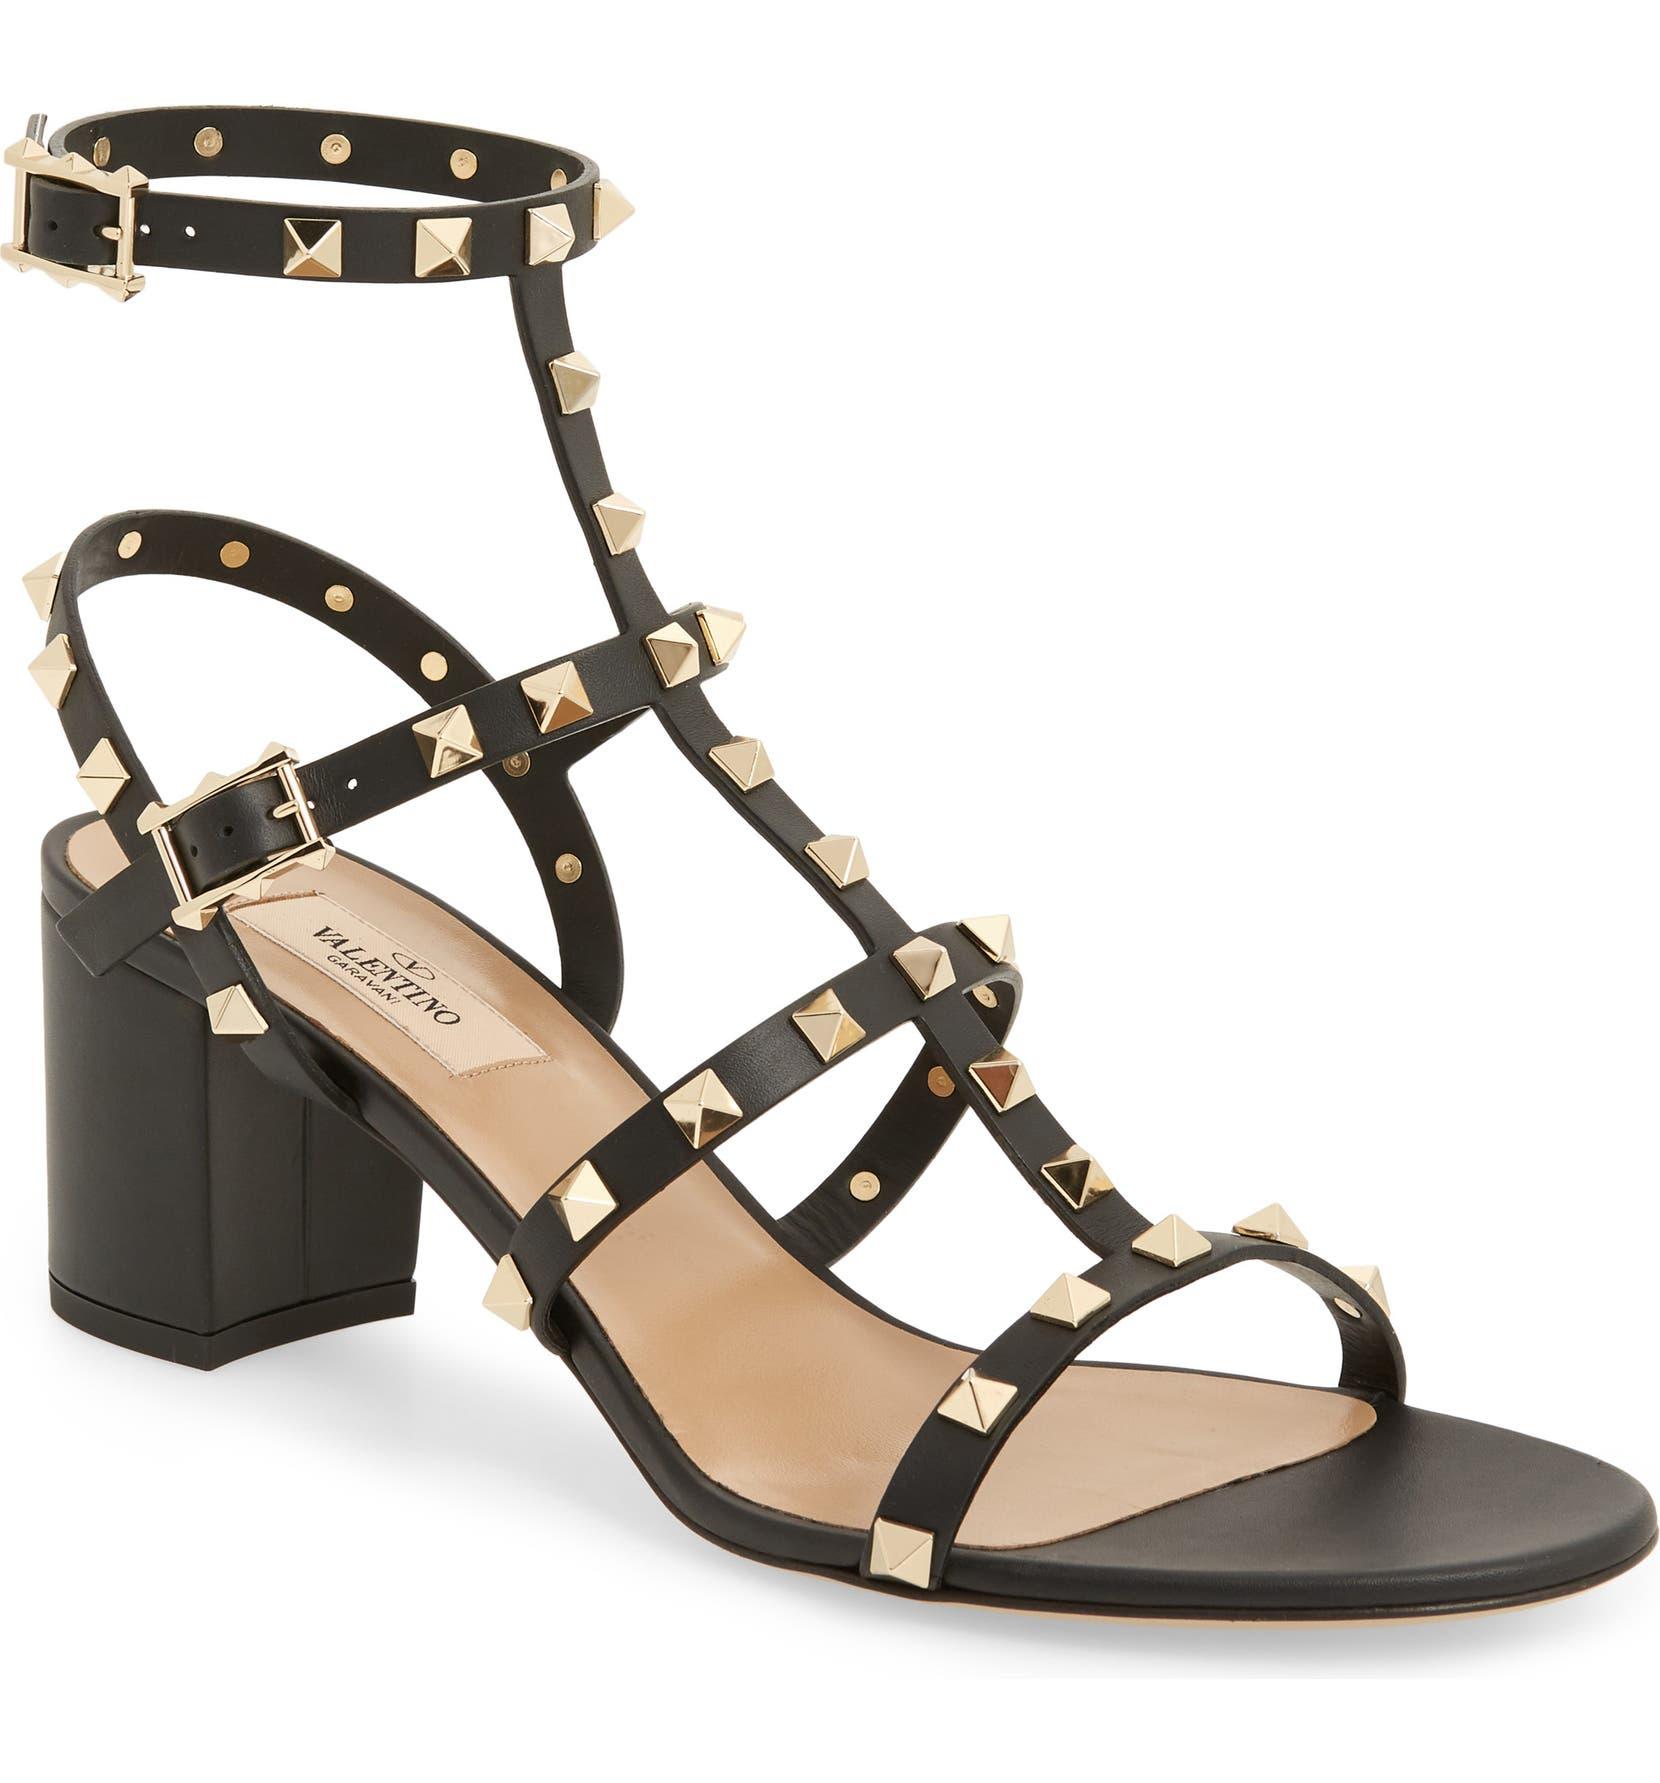 08d4c17a2de VALENTINO GARAVANI Rockstud Block Heel Sandal (Women)